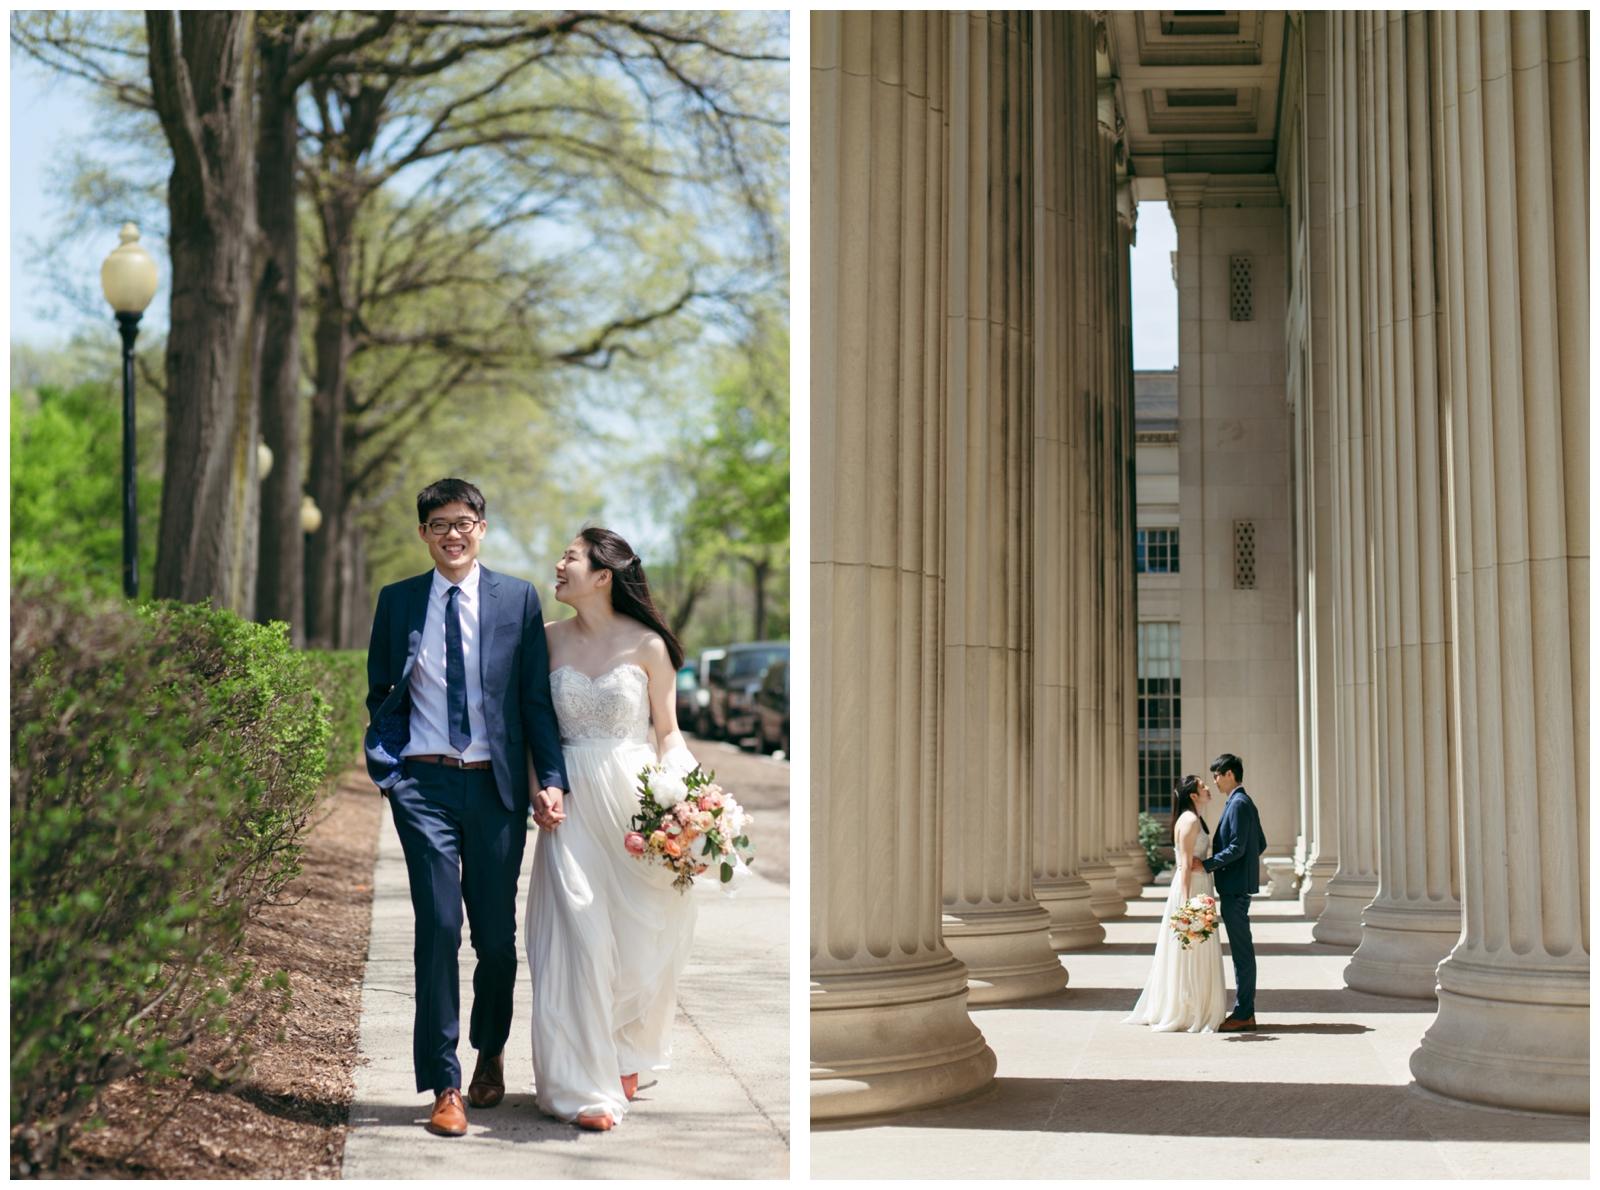 Samberg-Conference-Center-Boston-Wedding-Photographer-Bailey-Q-Photo-078.jpg